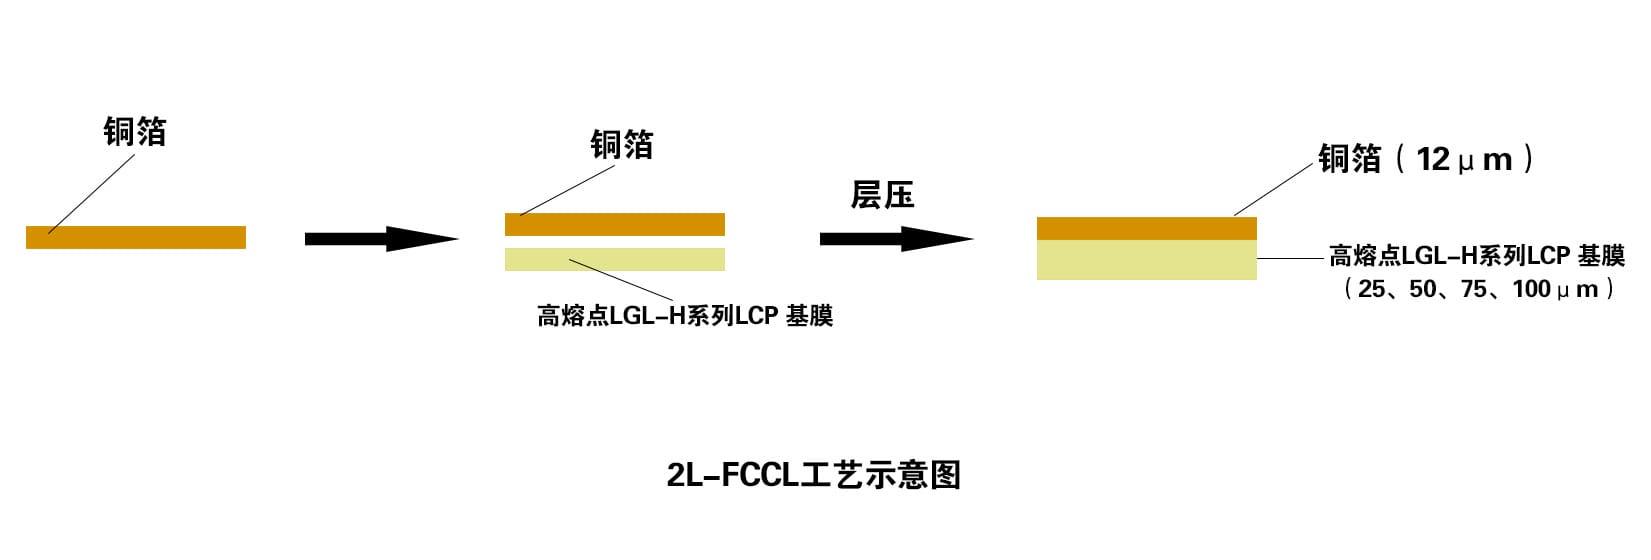 2L-FCCL工藝示意圖-單面.jpg